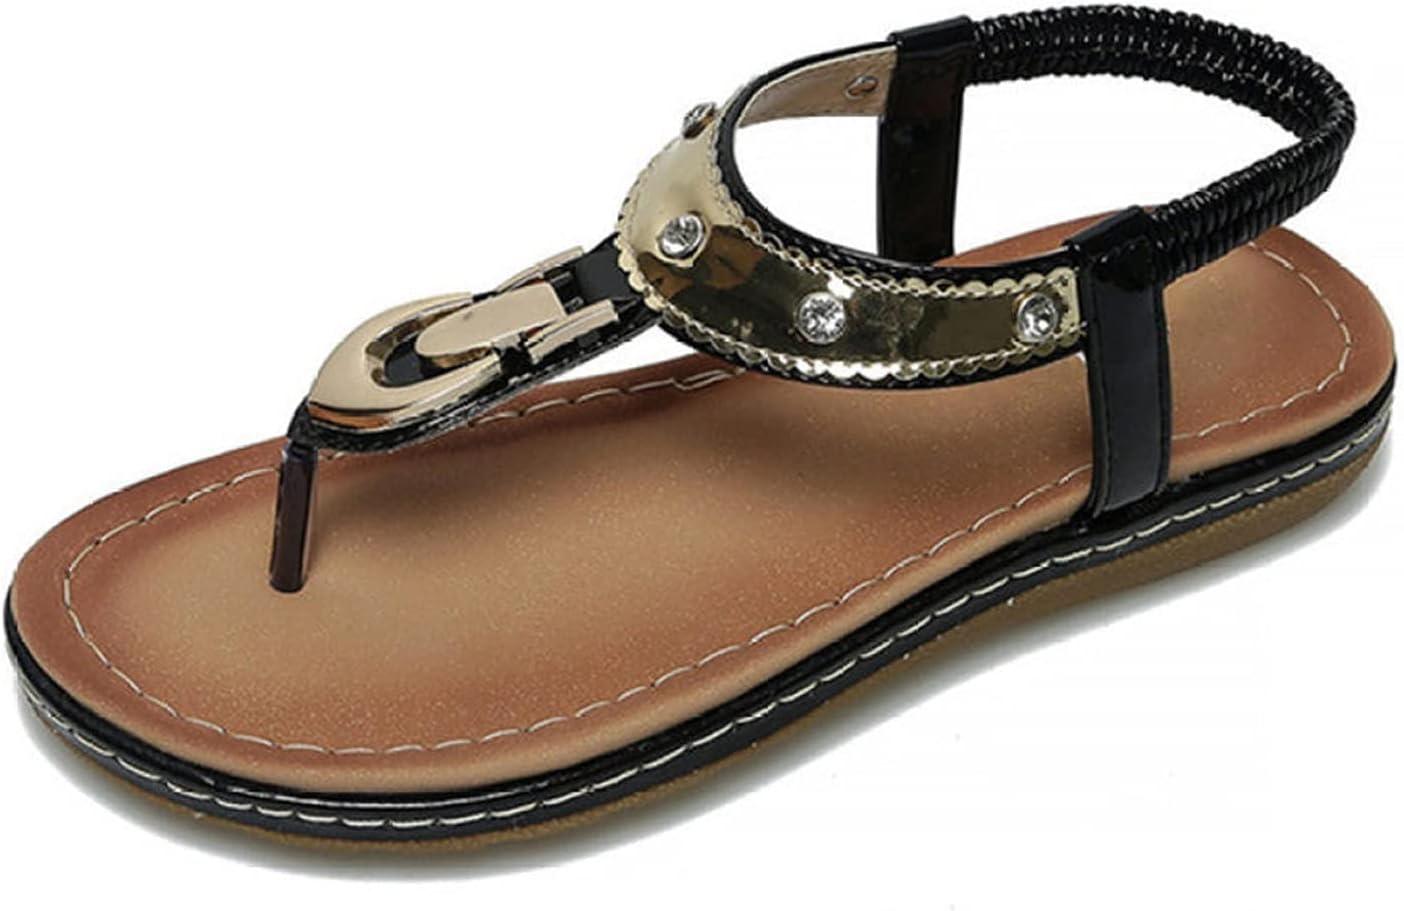 LIYDENG Sandals Ladies Japan's shopping largest assortment Summer Series Ladie Slippers Flat